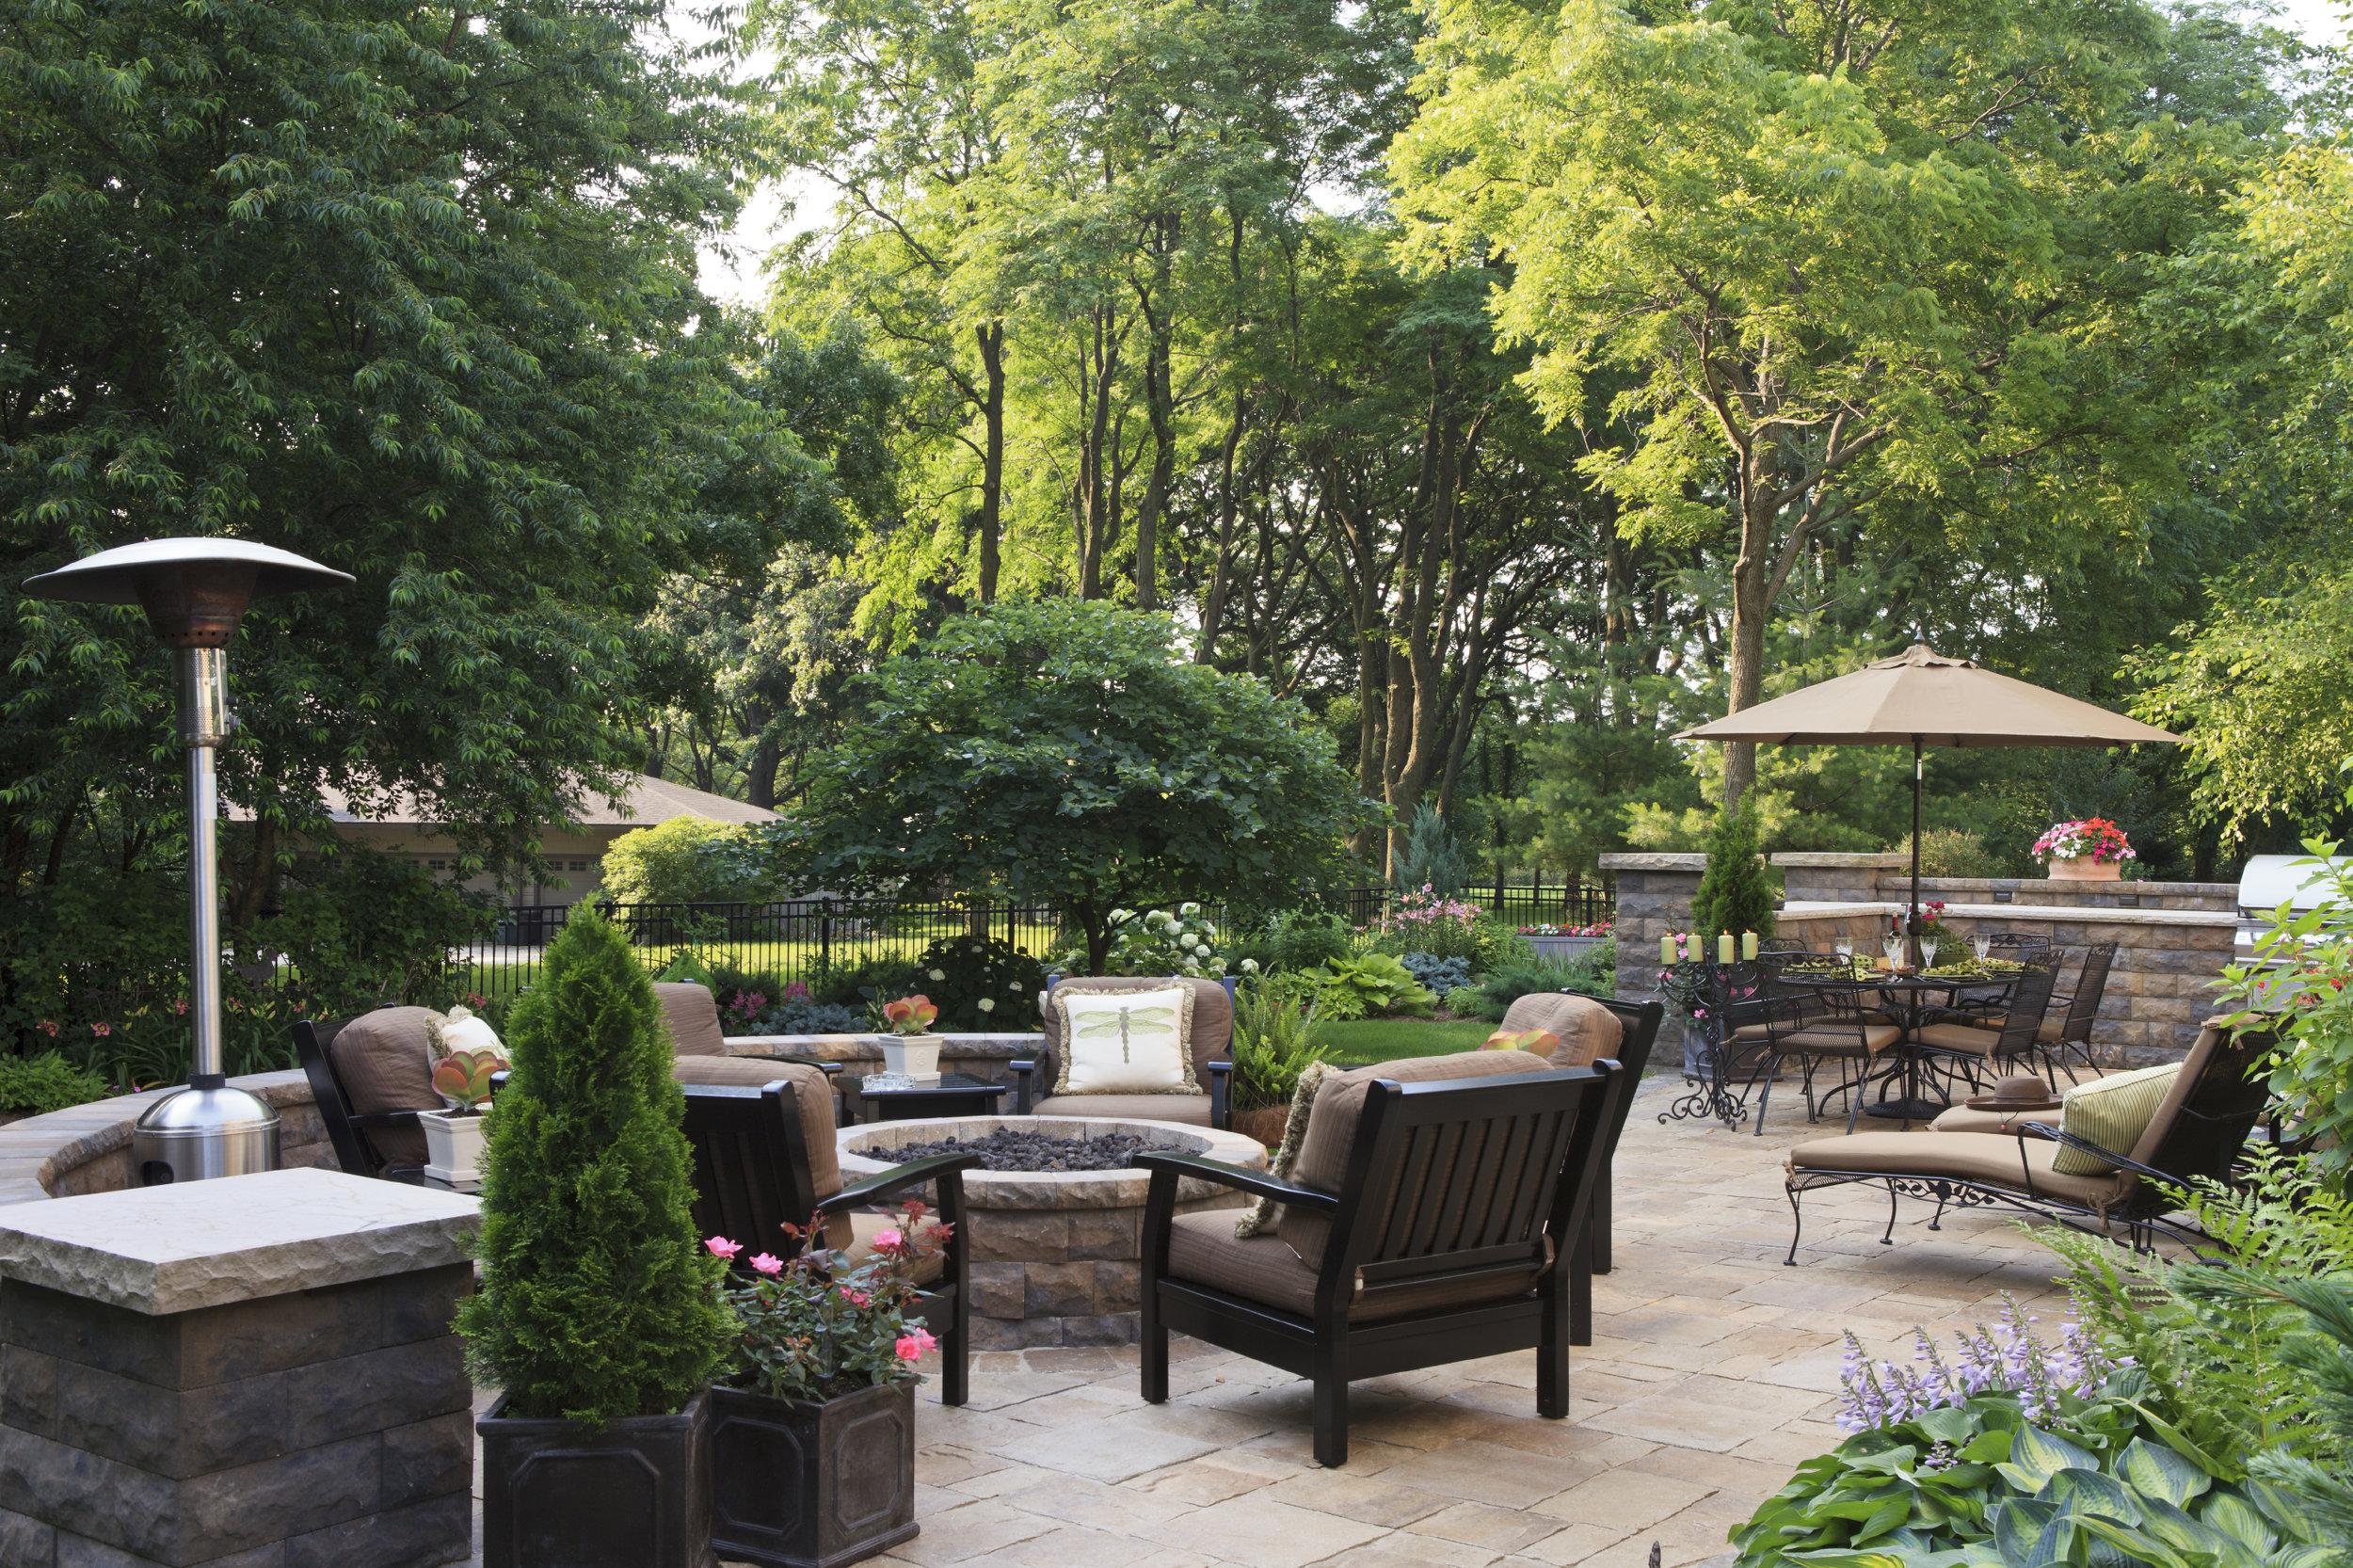 london-ontario-driveway-stone-firelpace-patio-landscaper-03.jpg